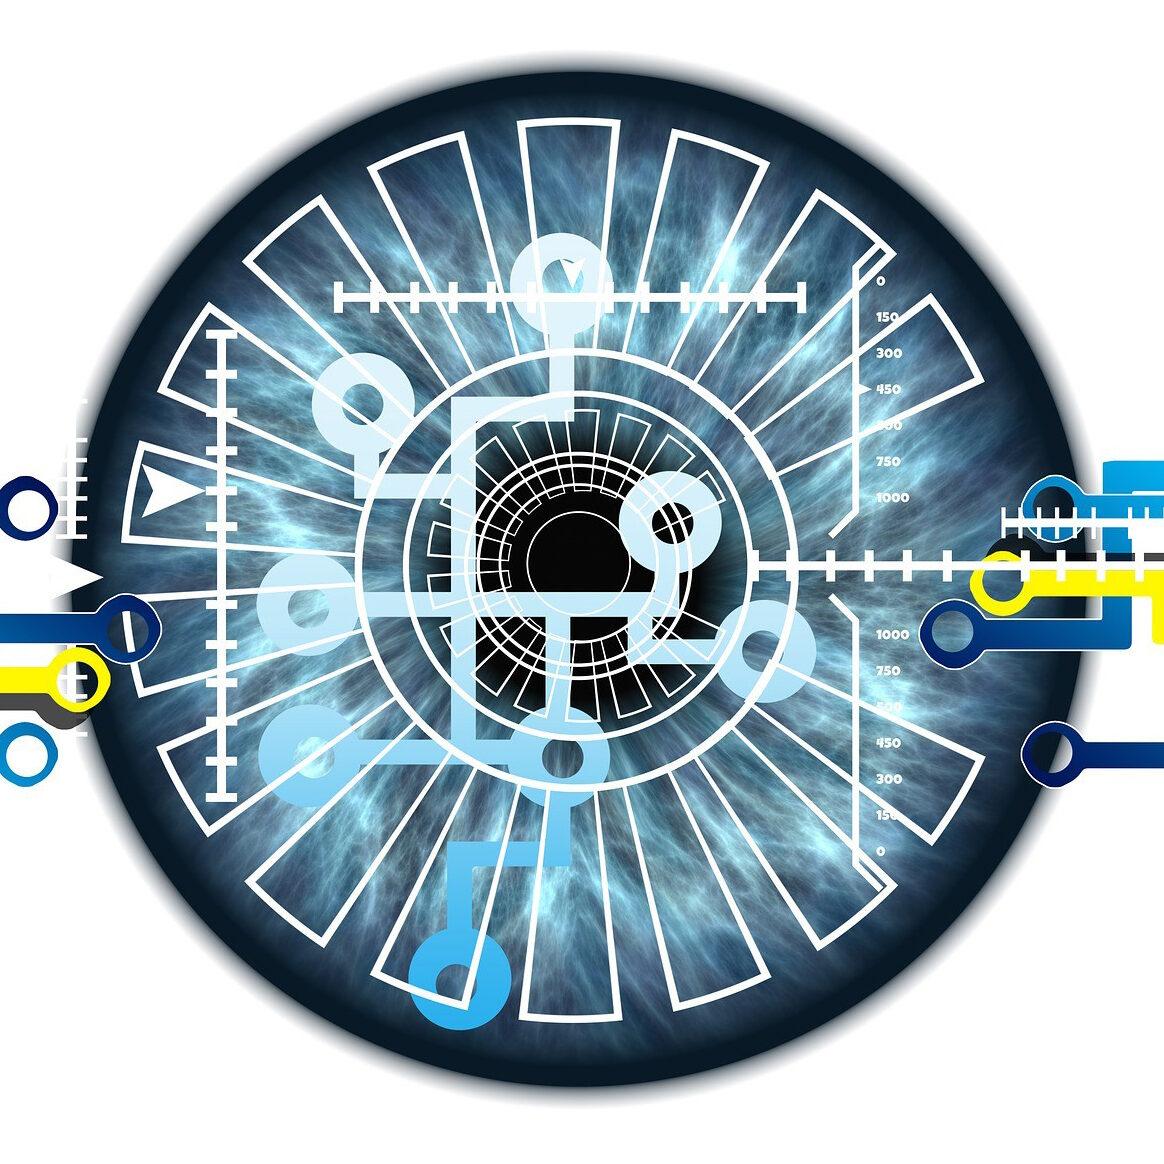 Datenschutzforum